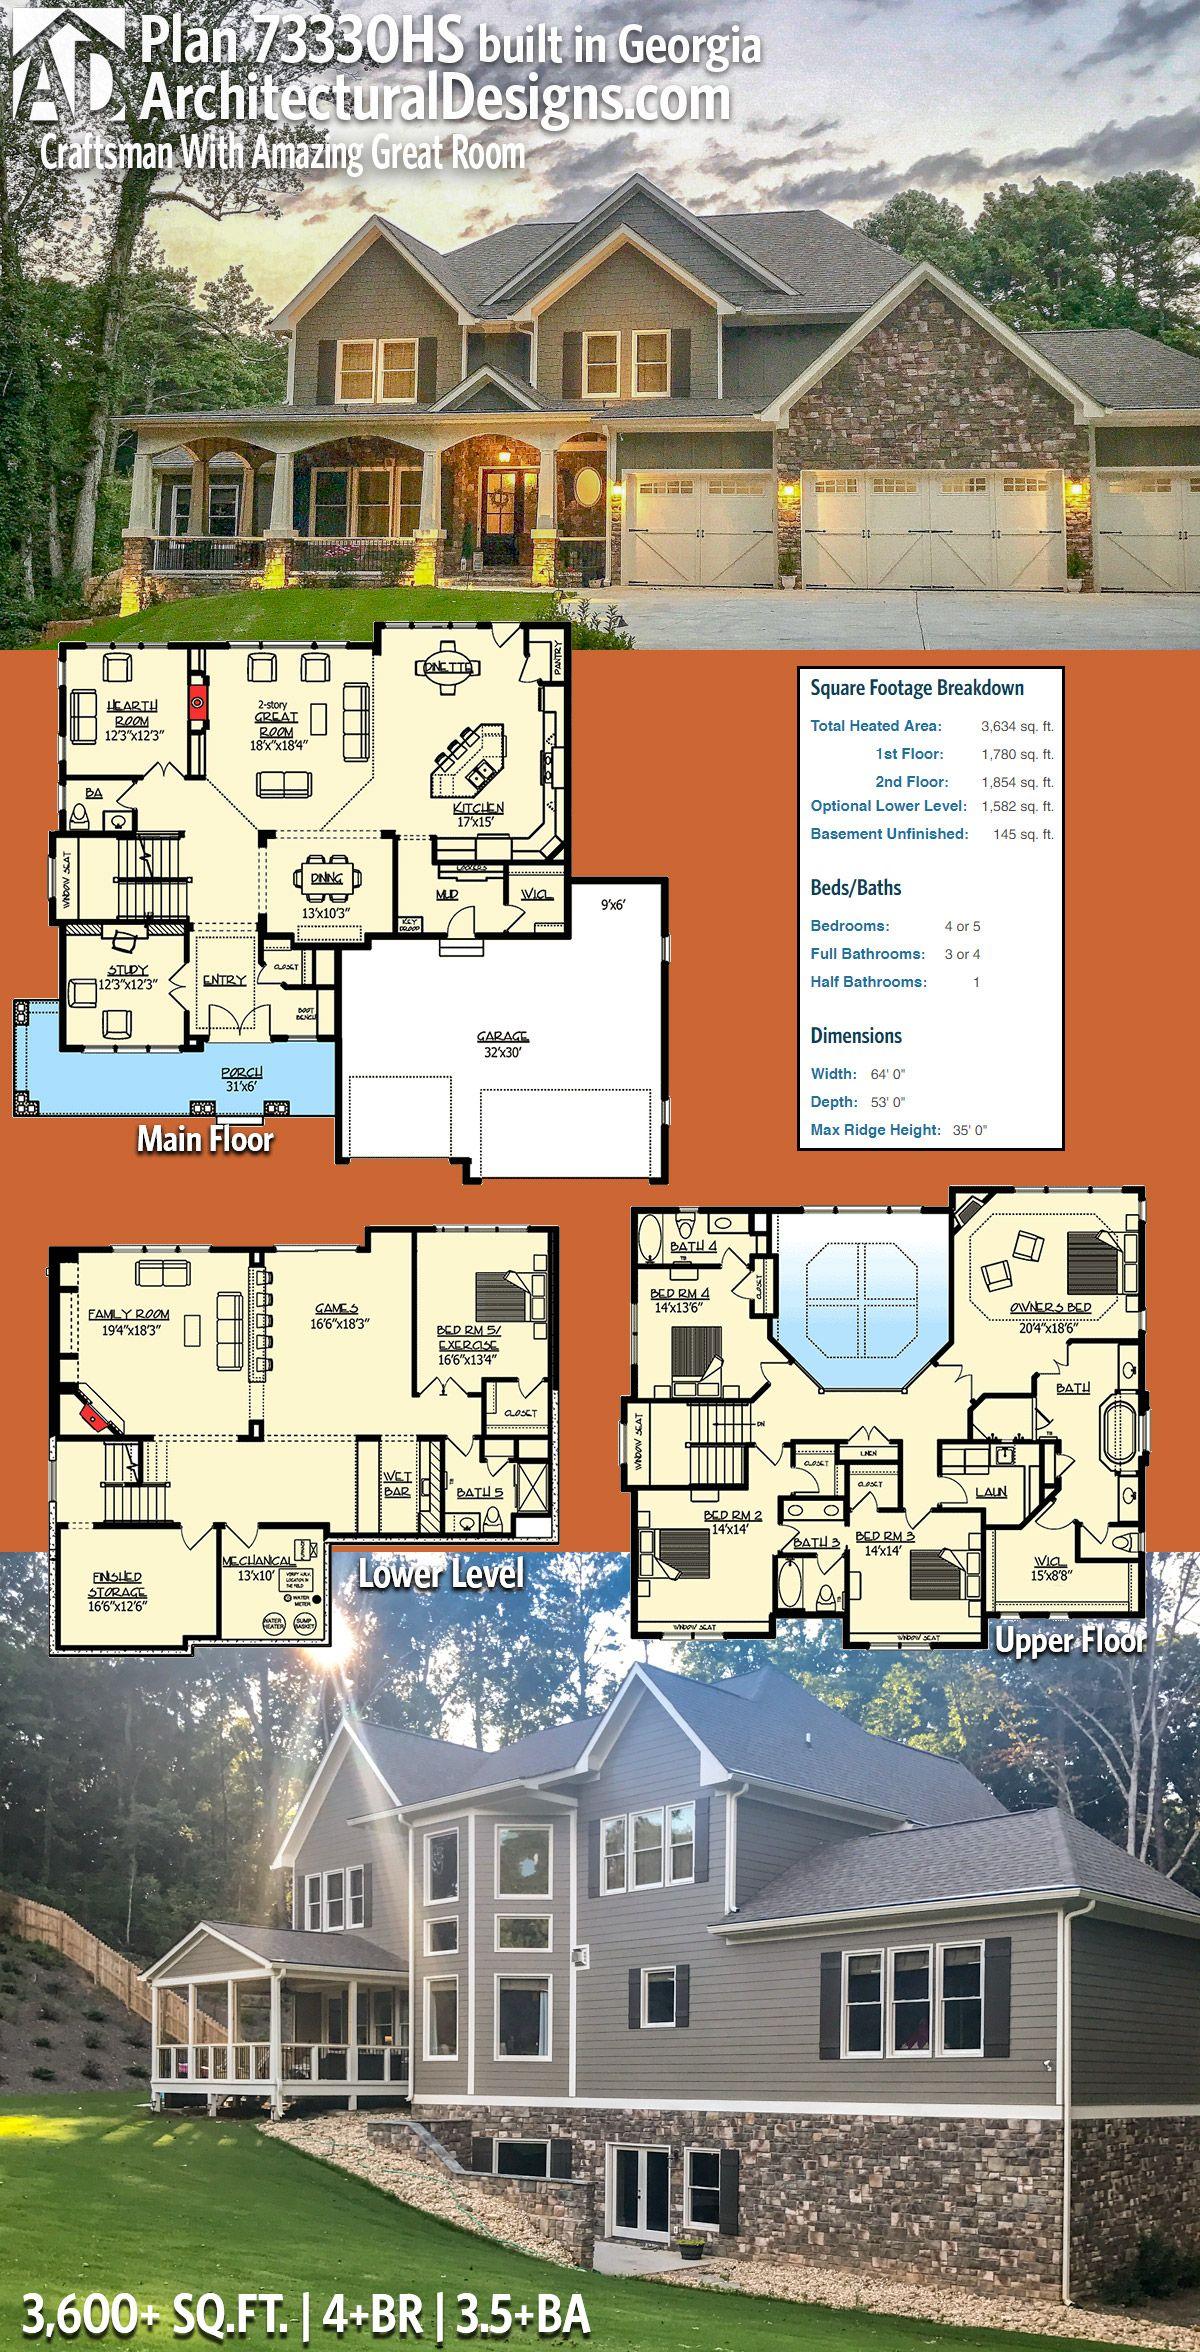 mygeorgiafarmhouse Architectural Designs Exclusive House Plan 73330HS